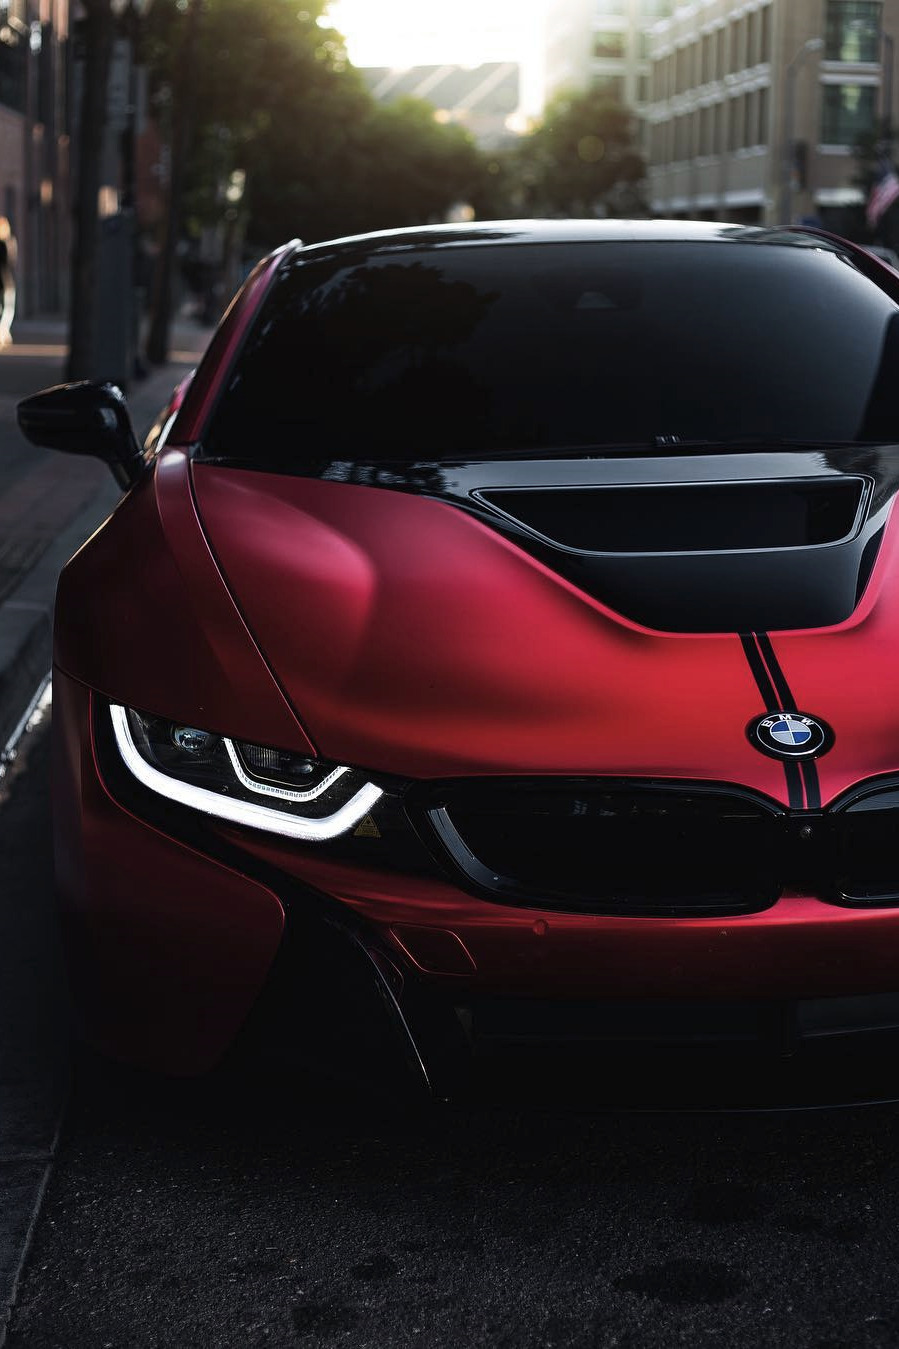 Matte Black Luxury Car Wallpaper Underworld